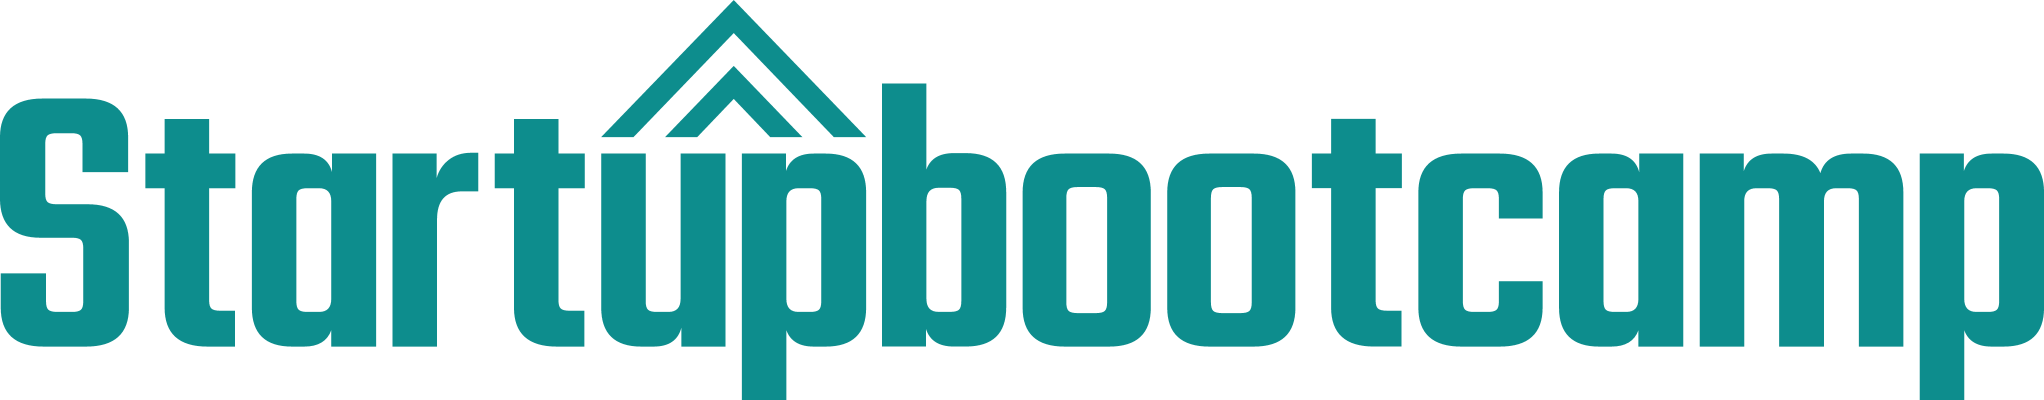 Masterbrand Logo (1)_rgb_2044_400